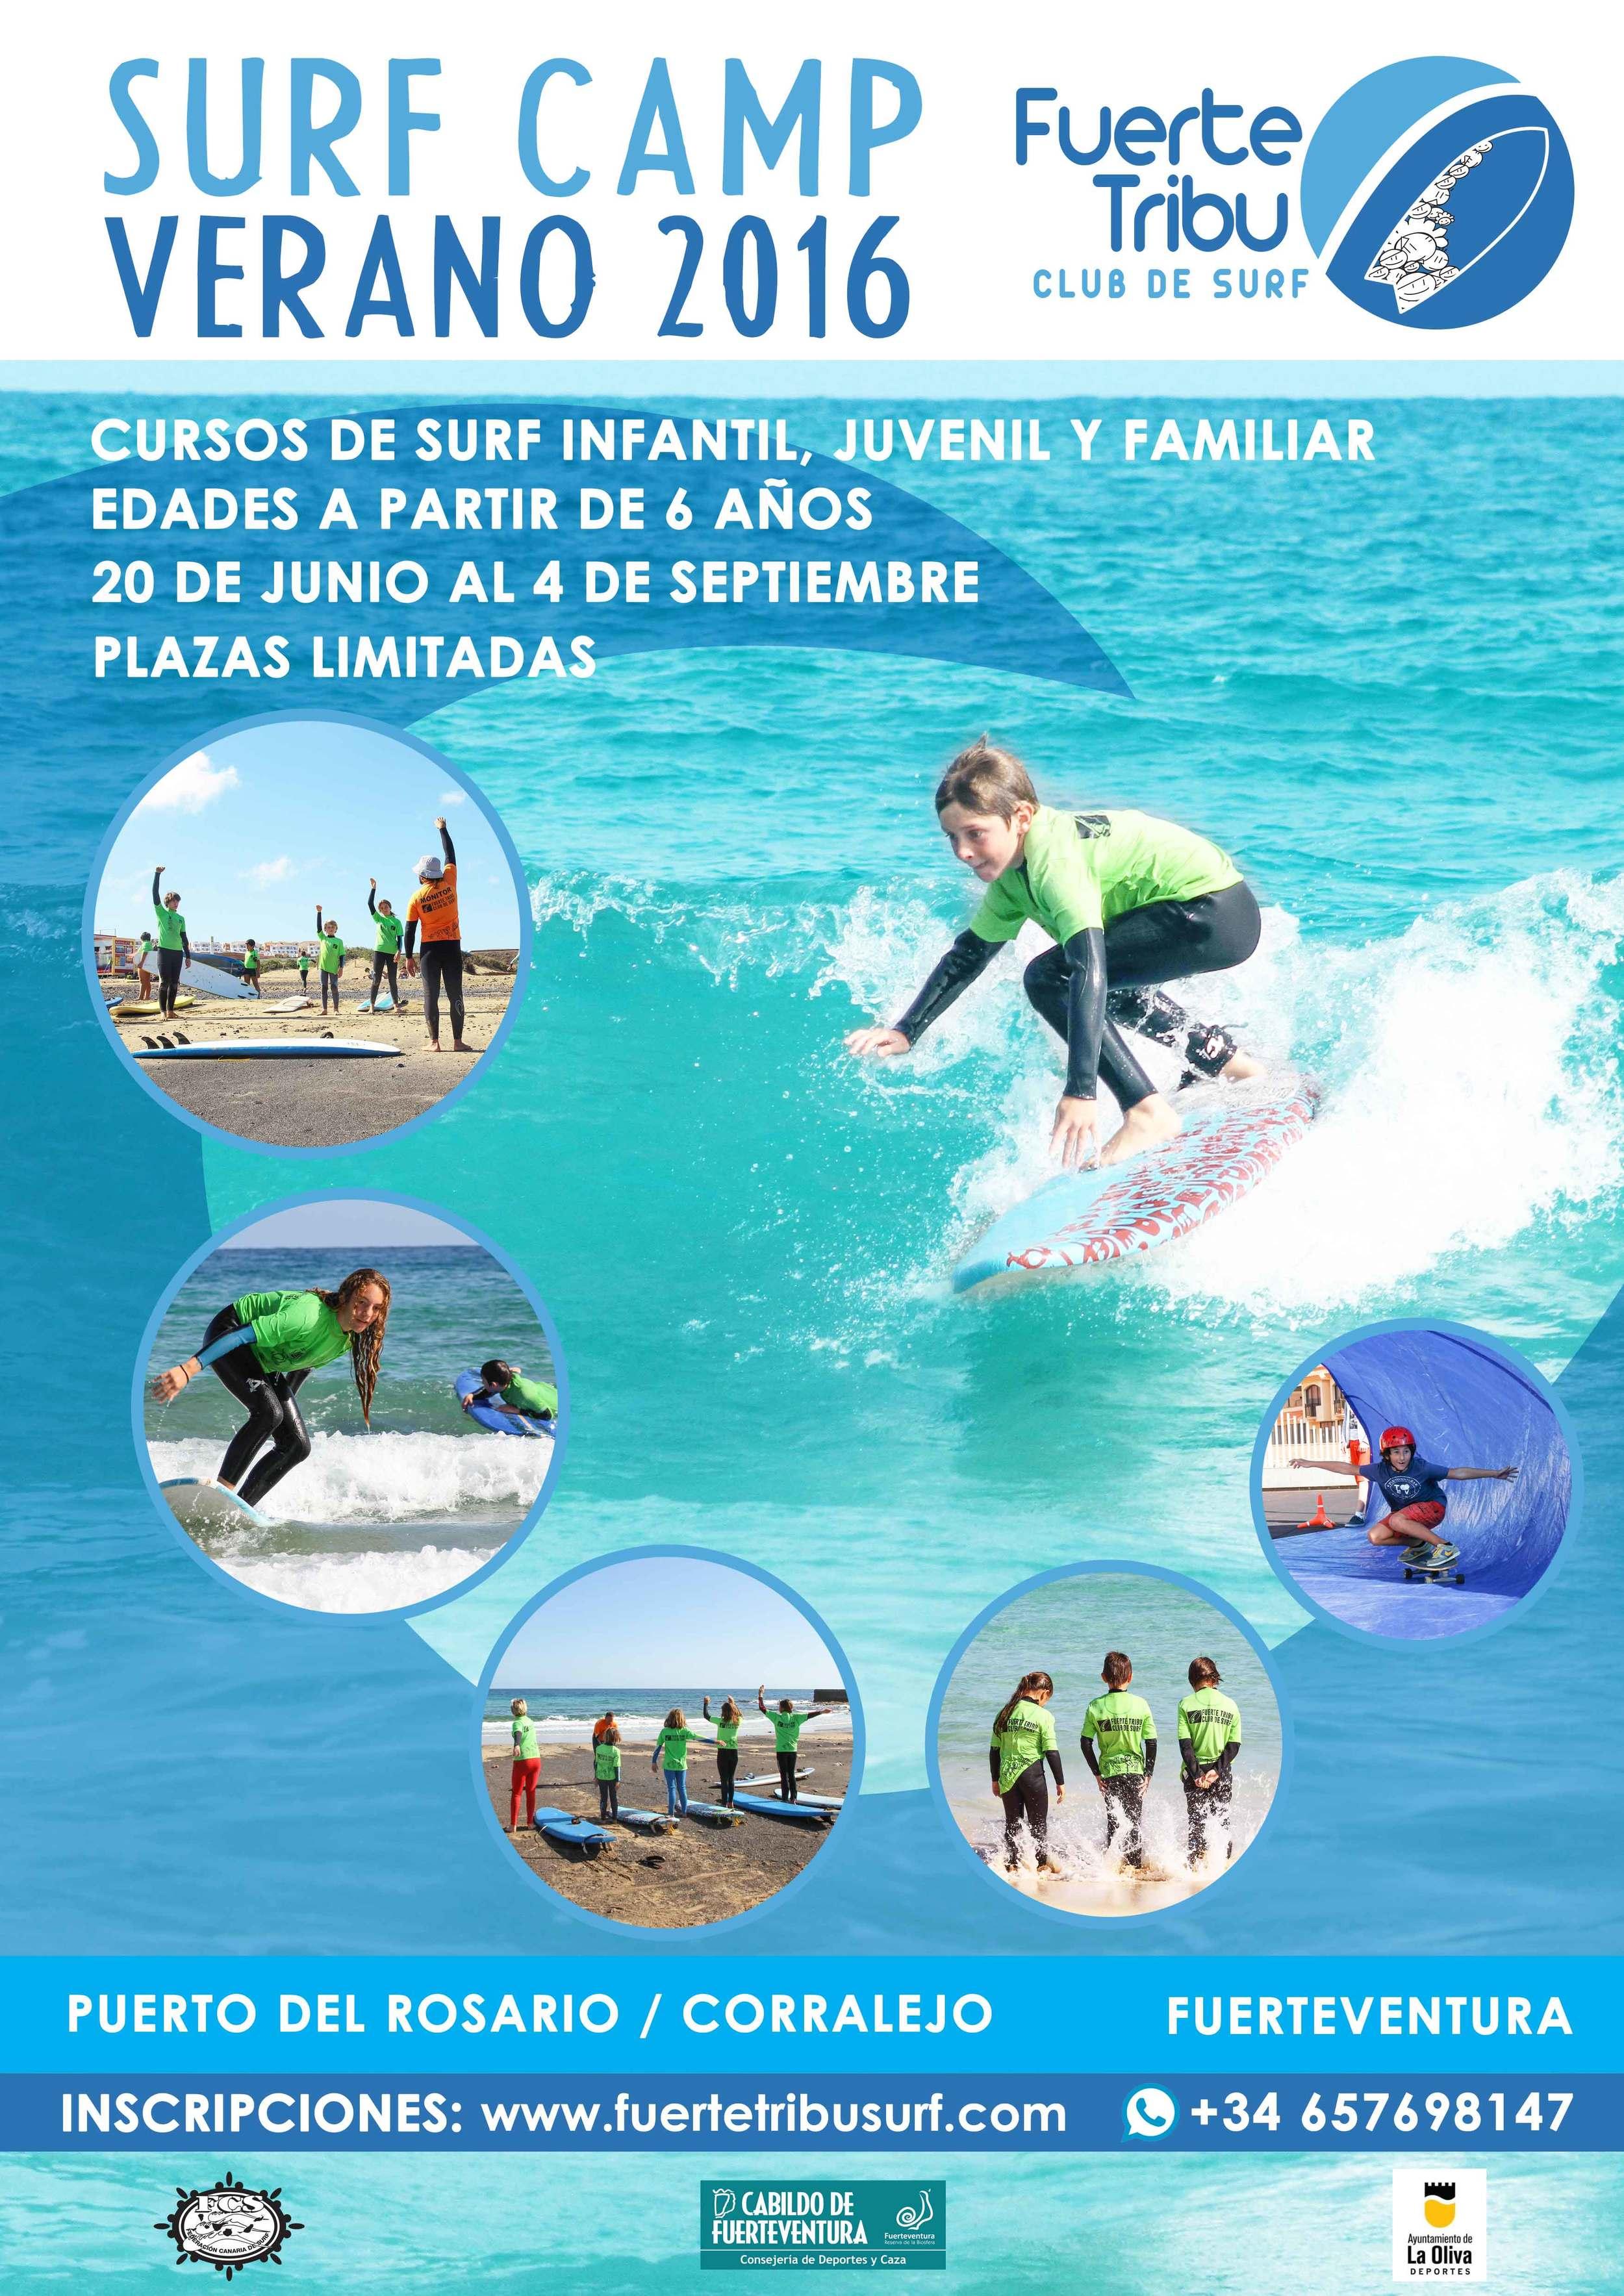 SURF CAMP VERANO  FUERTEVENTURA